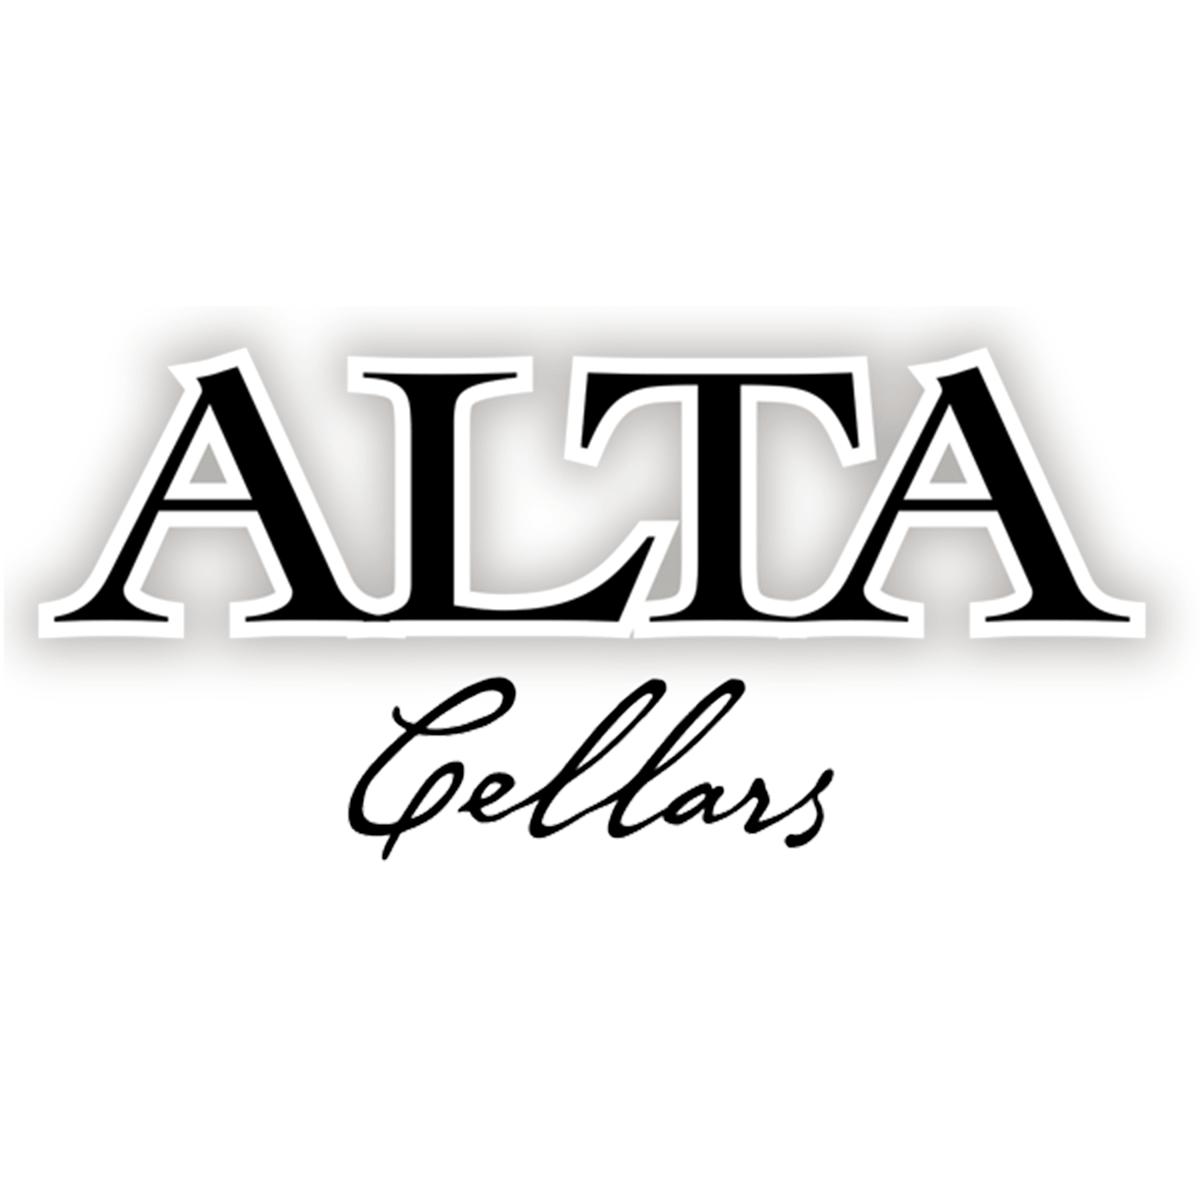 Alta Cellars logo